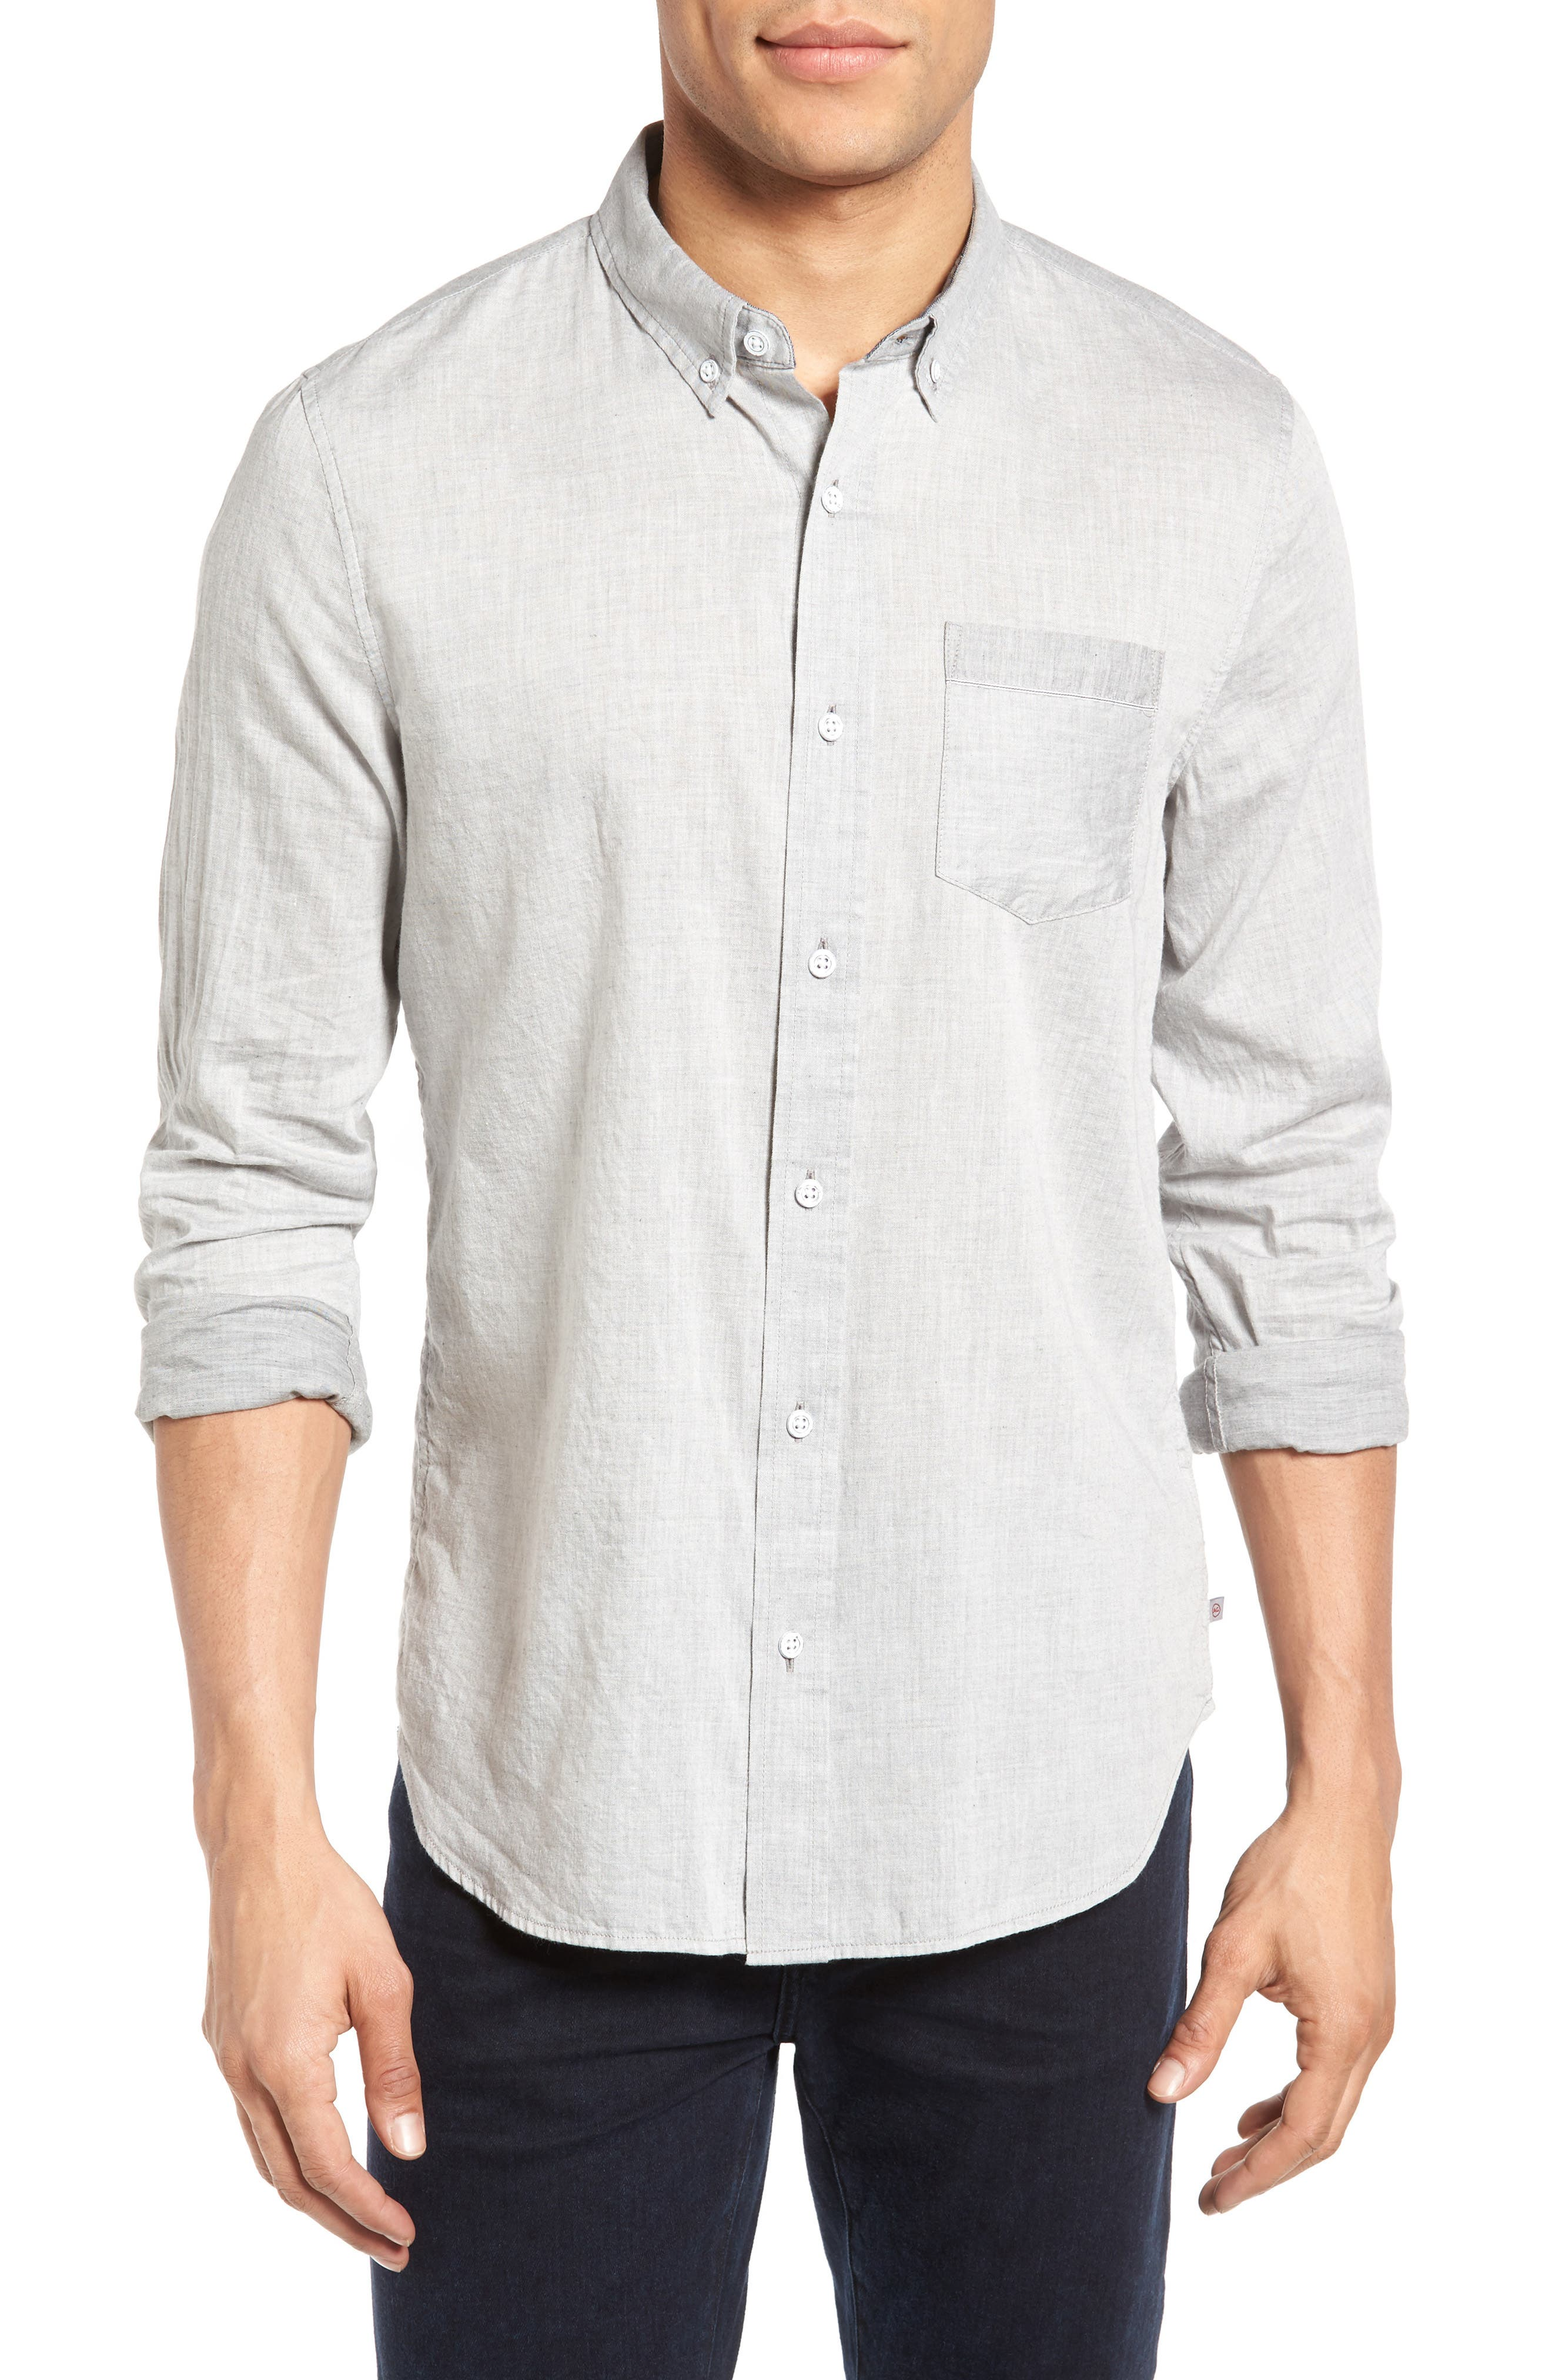 Grady Trim Fit Sport Shirt,                         Main,                         color, Heather Grey